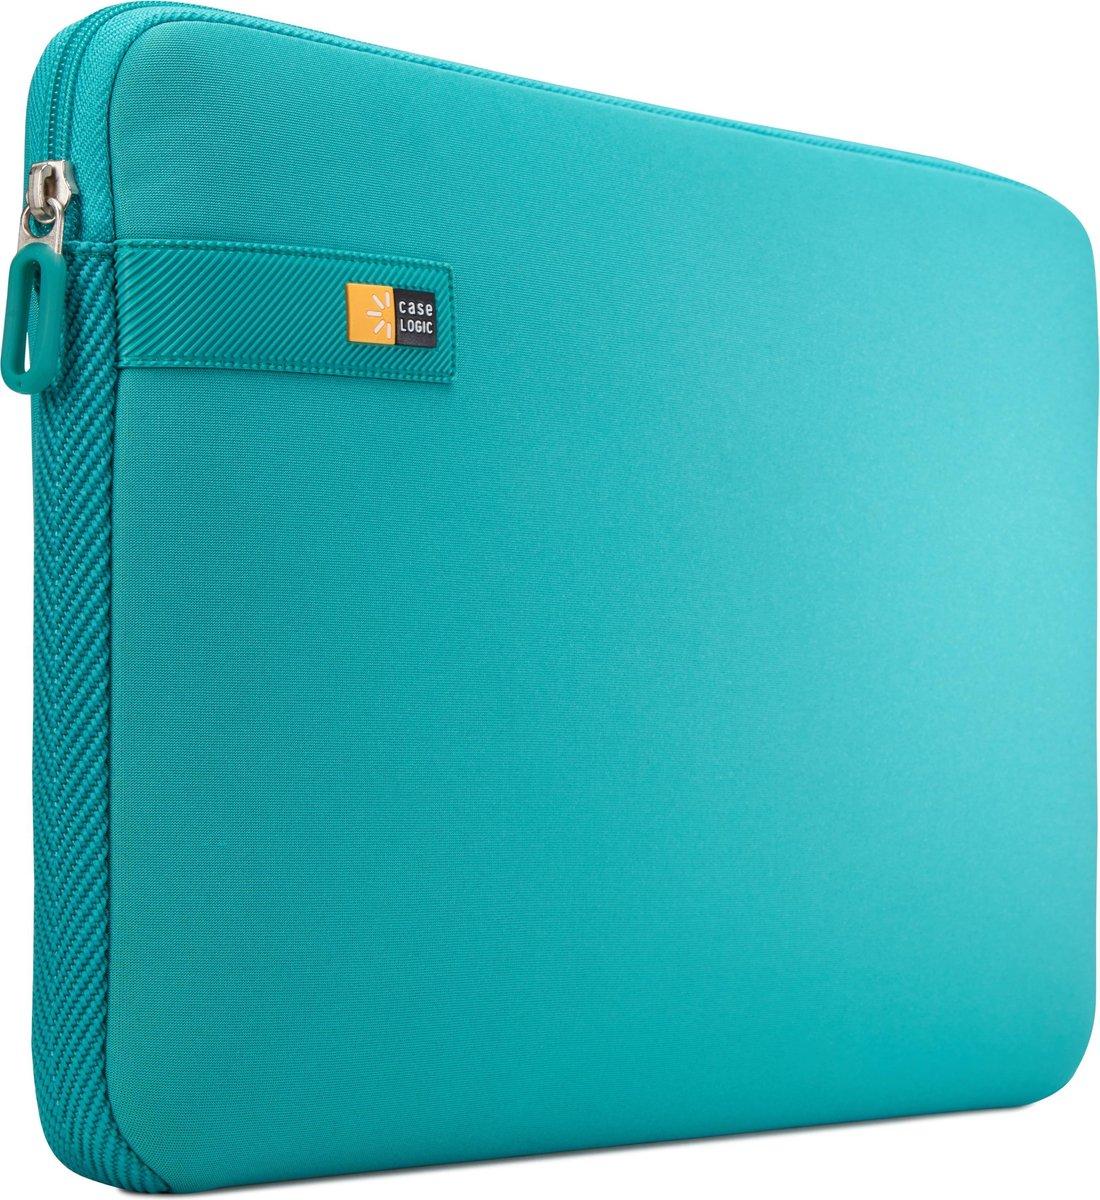 Case Logic LAPS114 - Laptophoes 14 inch - Turquoise